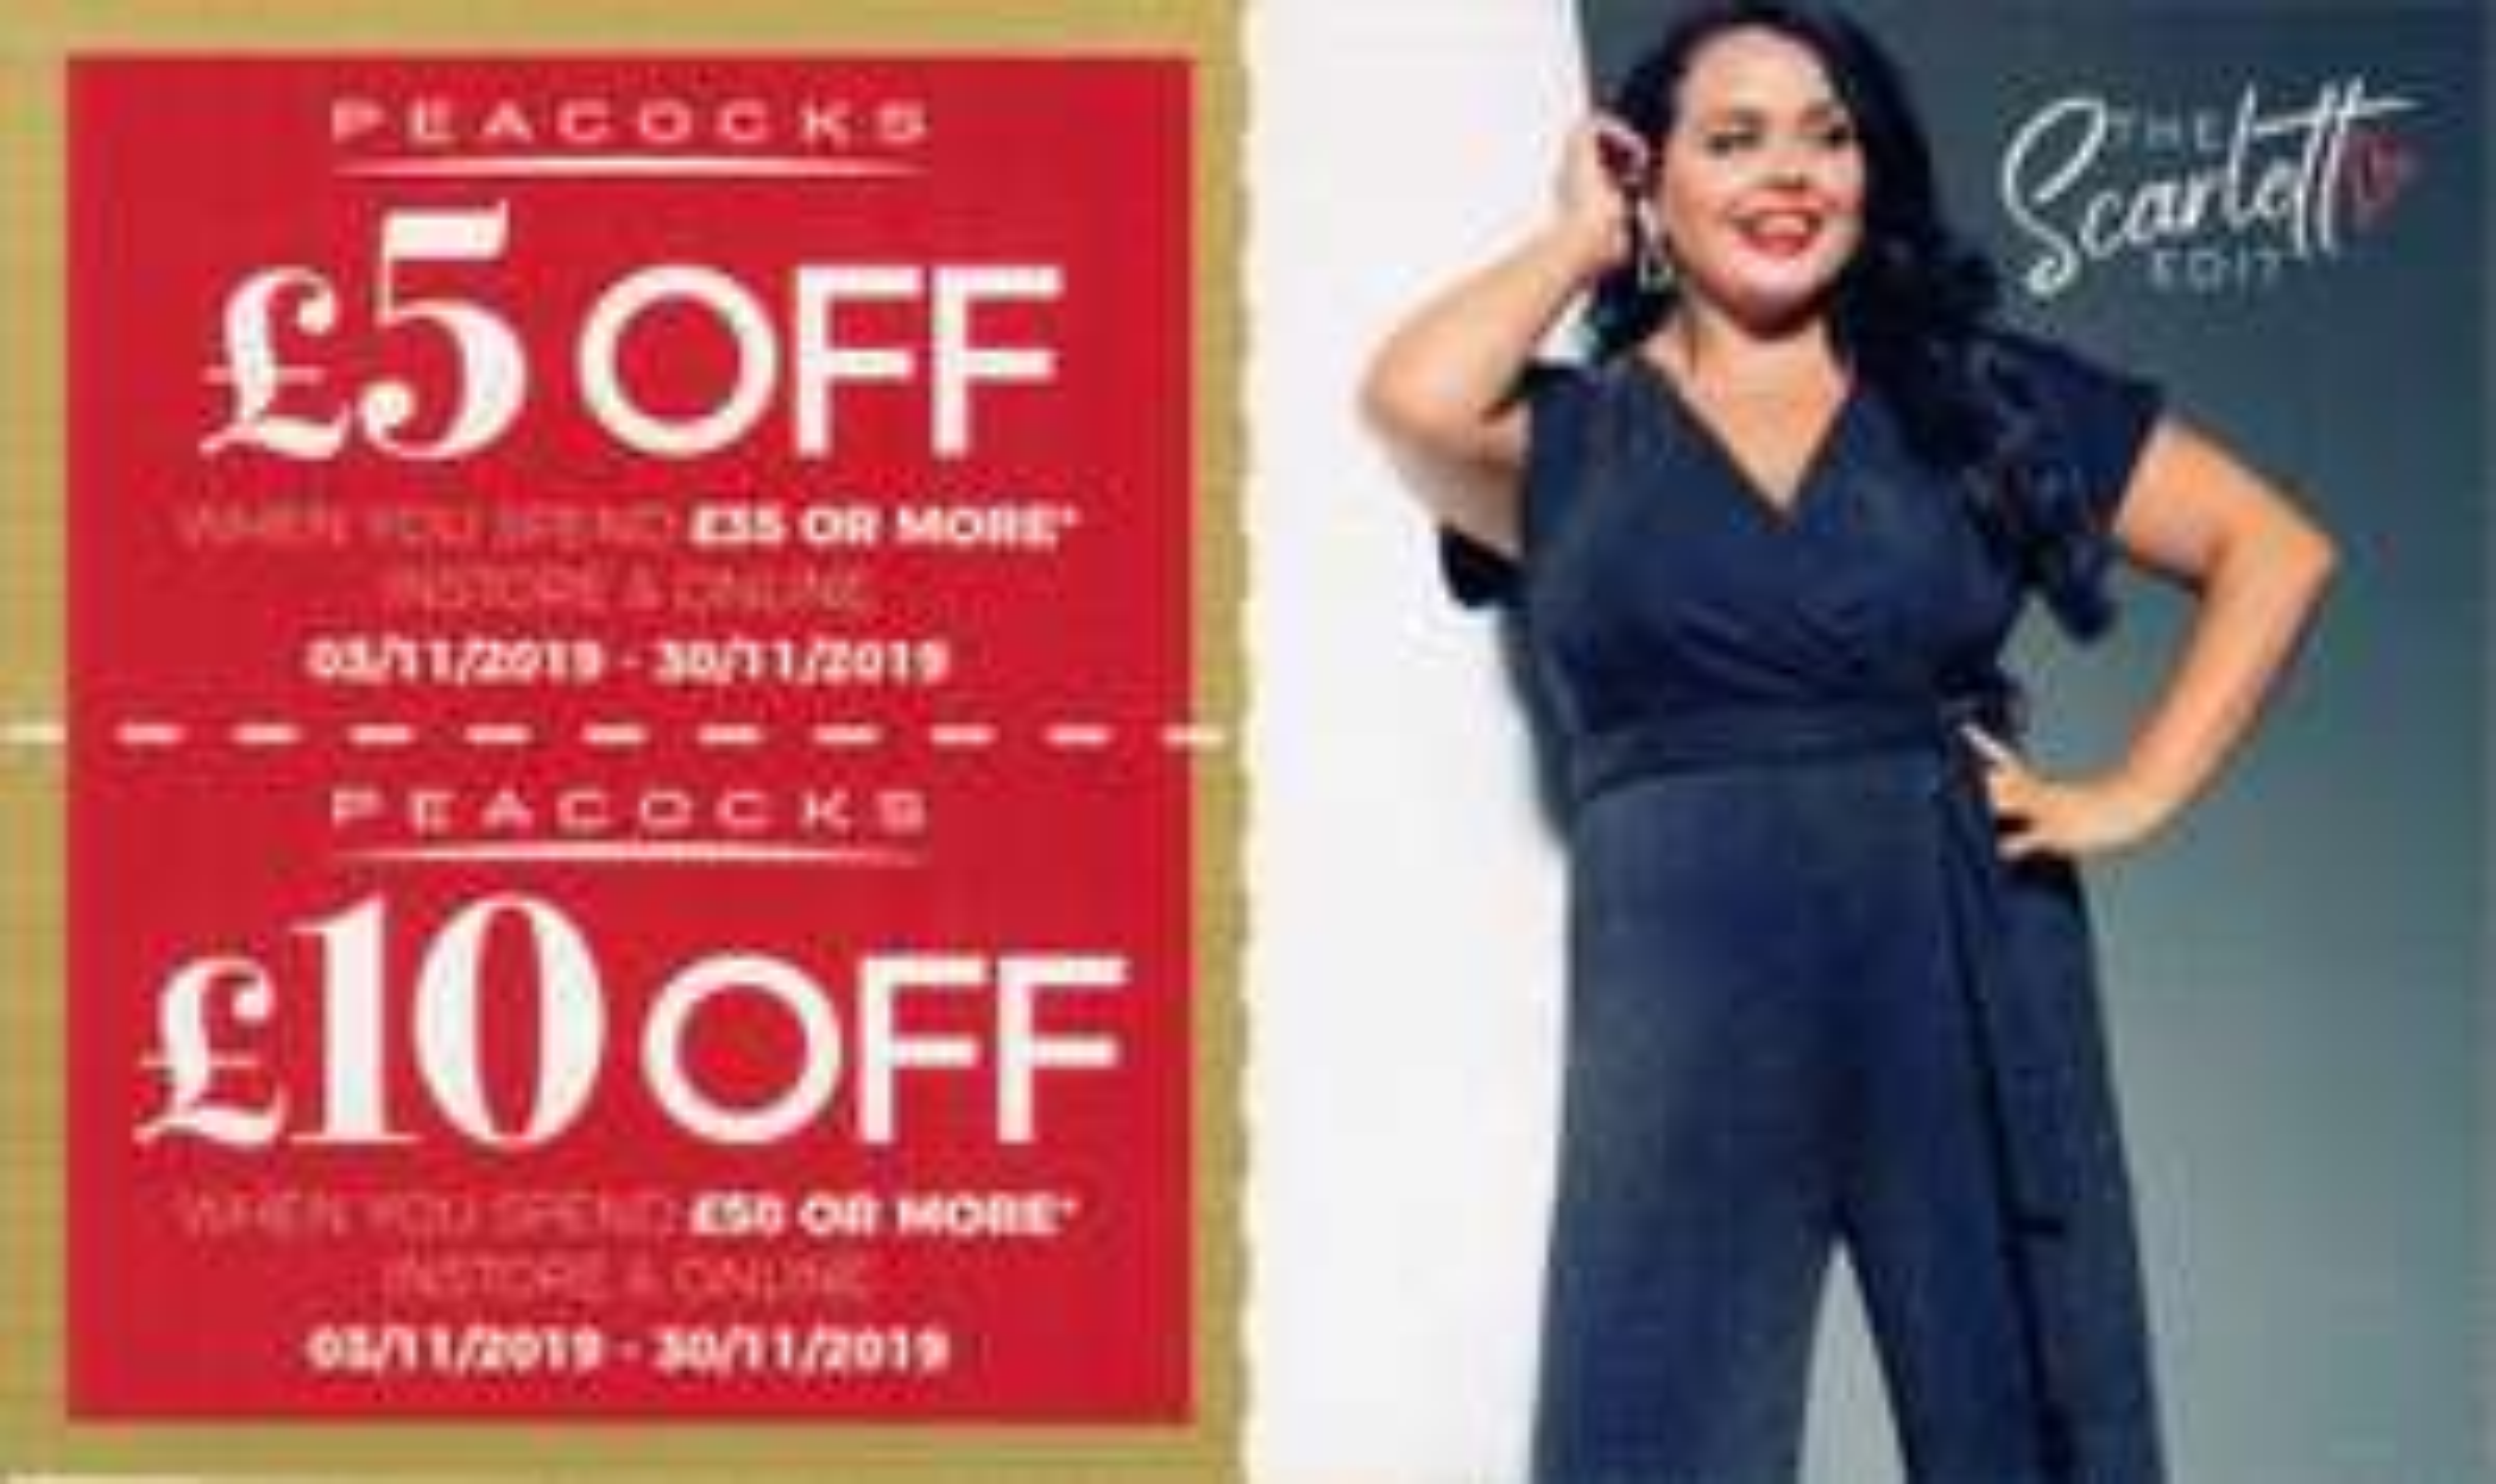 Voucher codes for £5 off £35 / £10 off £50 @ Peacocks online until 30th Nov)